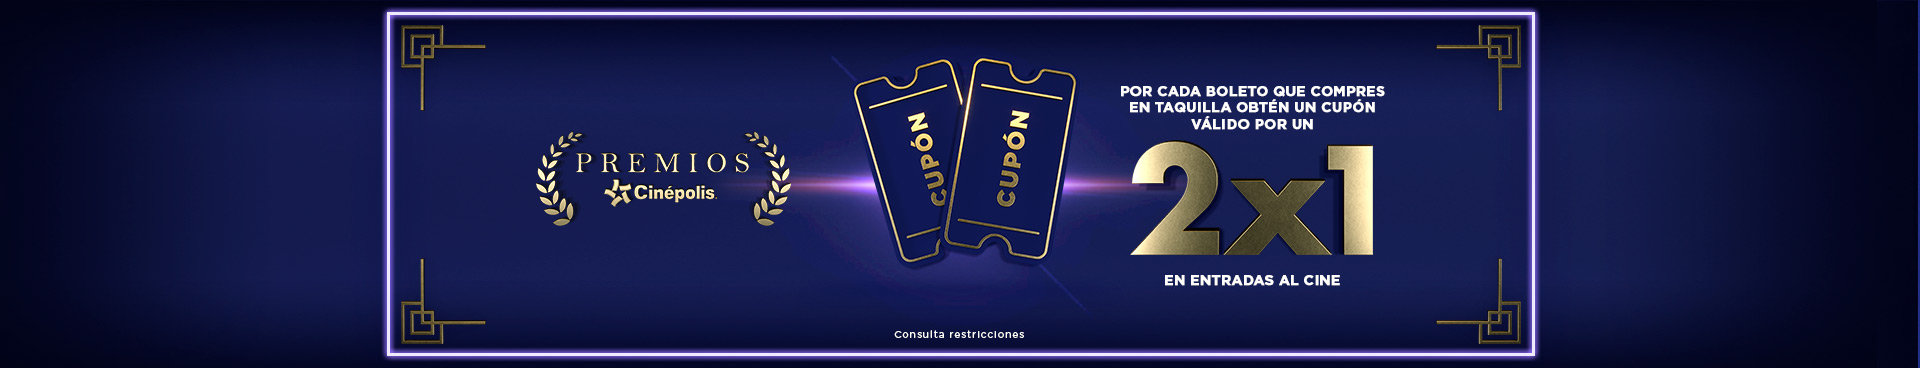 Premios Cinépolis: Taquilla 2x1